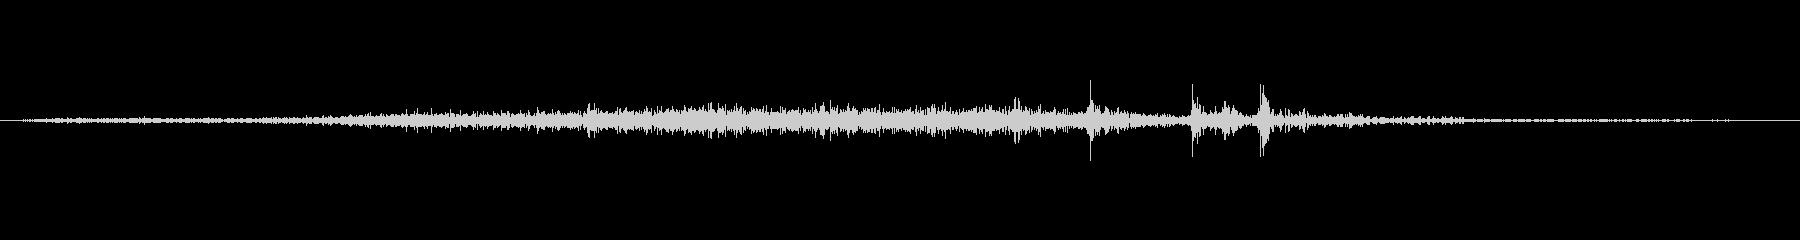 【wav】ページめくり音です_01の未再生の波形